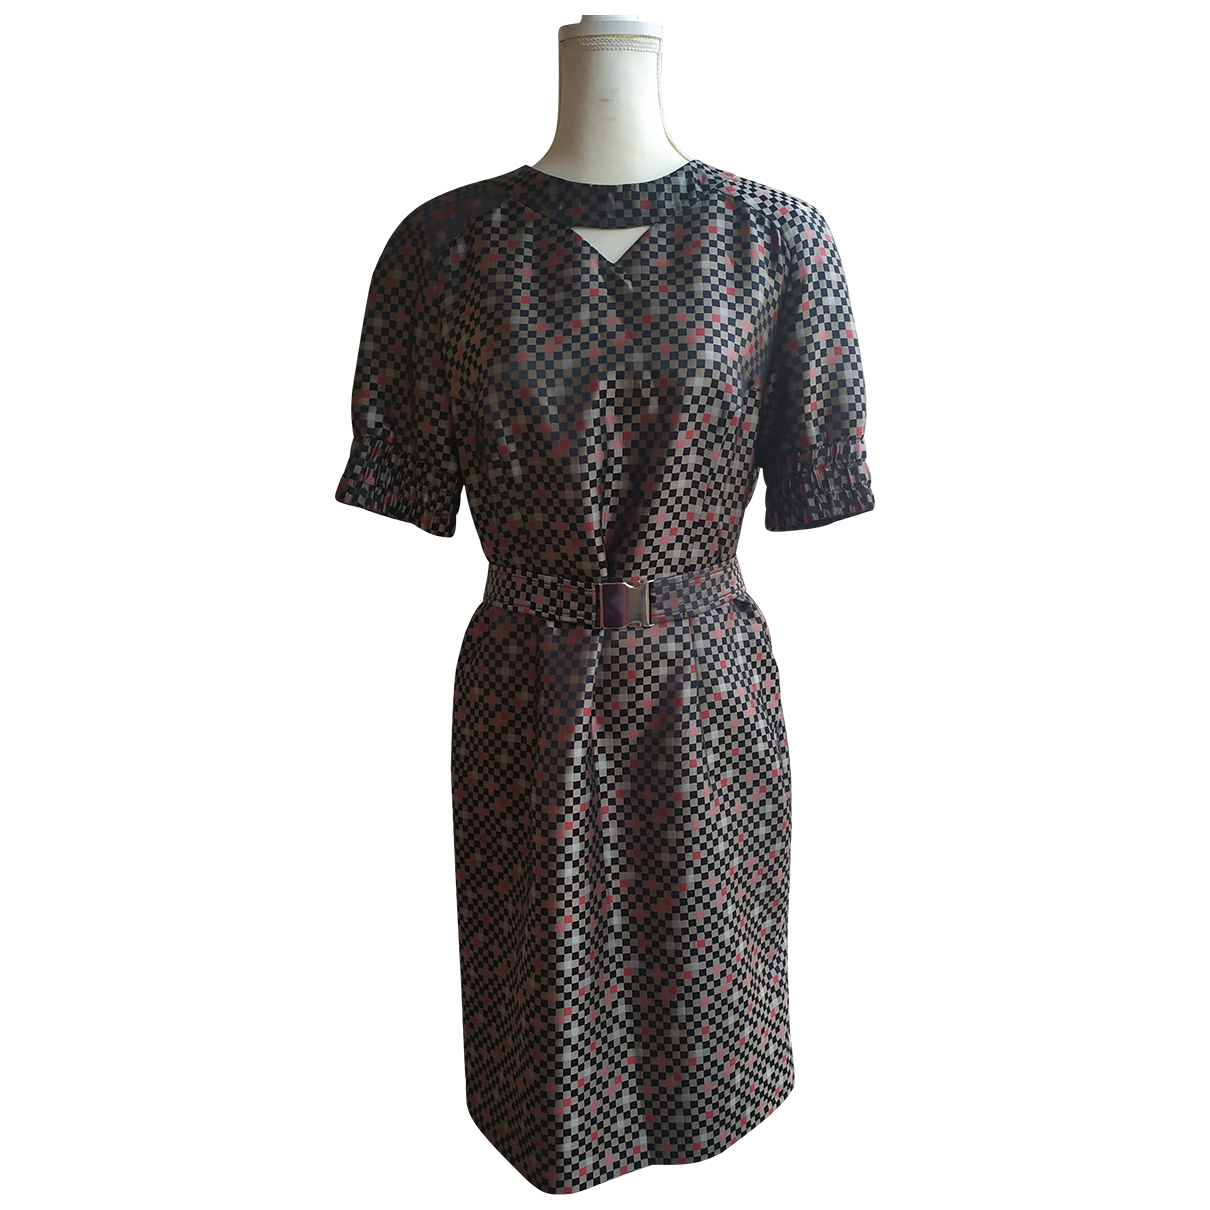 Jc De Castelbajac \N Kleid in  Bunt Polyester